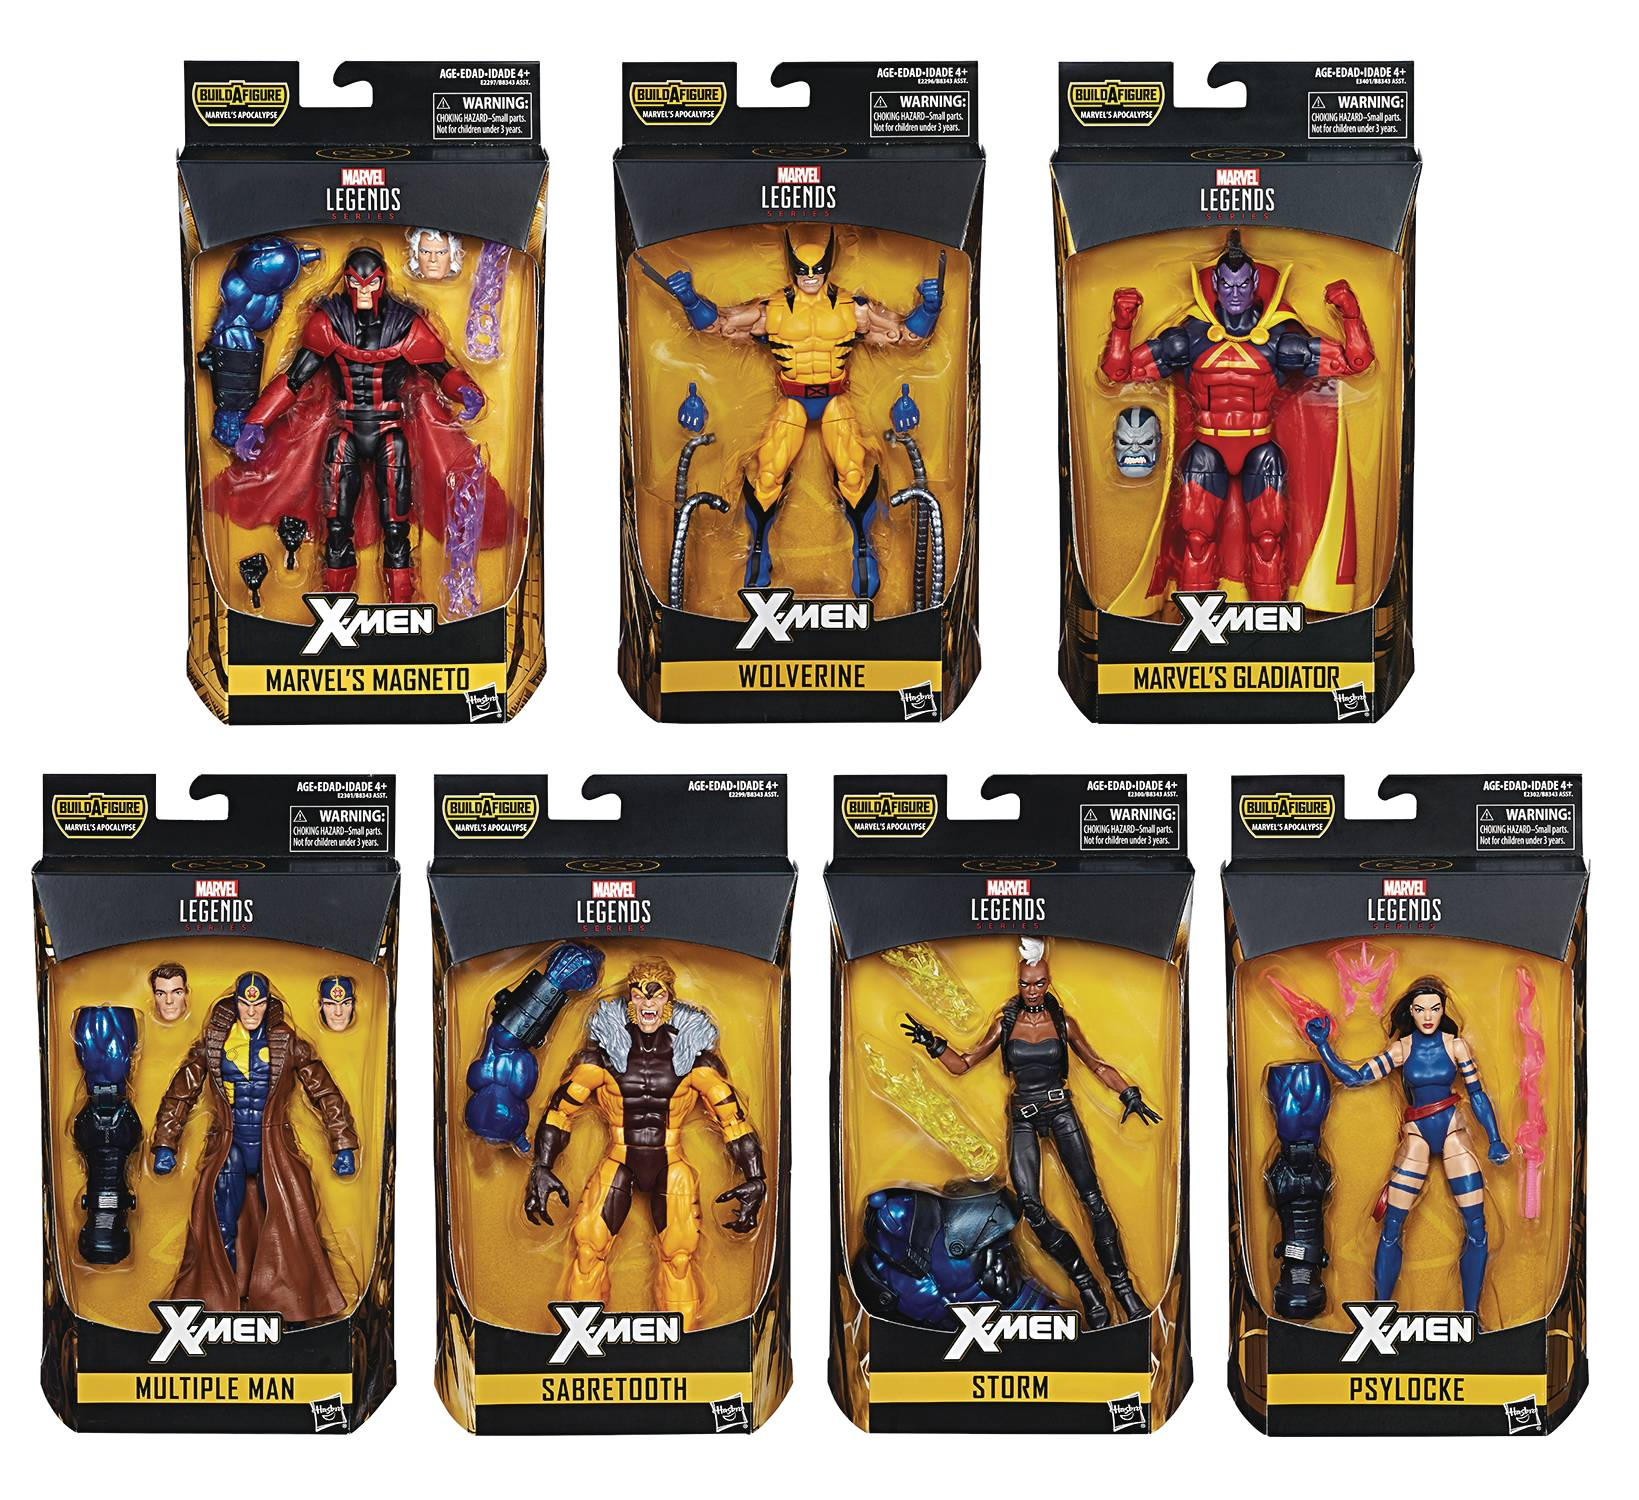 x-men legendary assortment. Psylocke, storm, sabretooth, multiple man, magneto, wolverine, gladiator